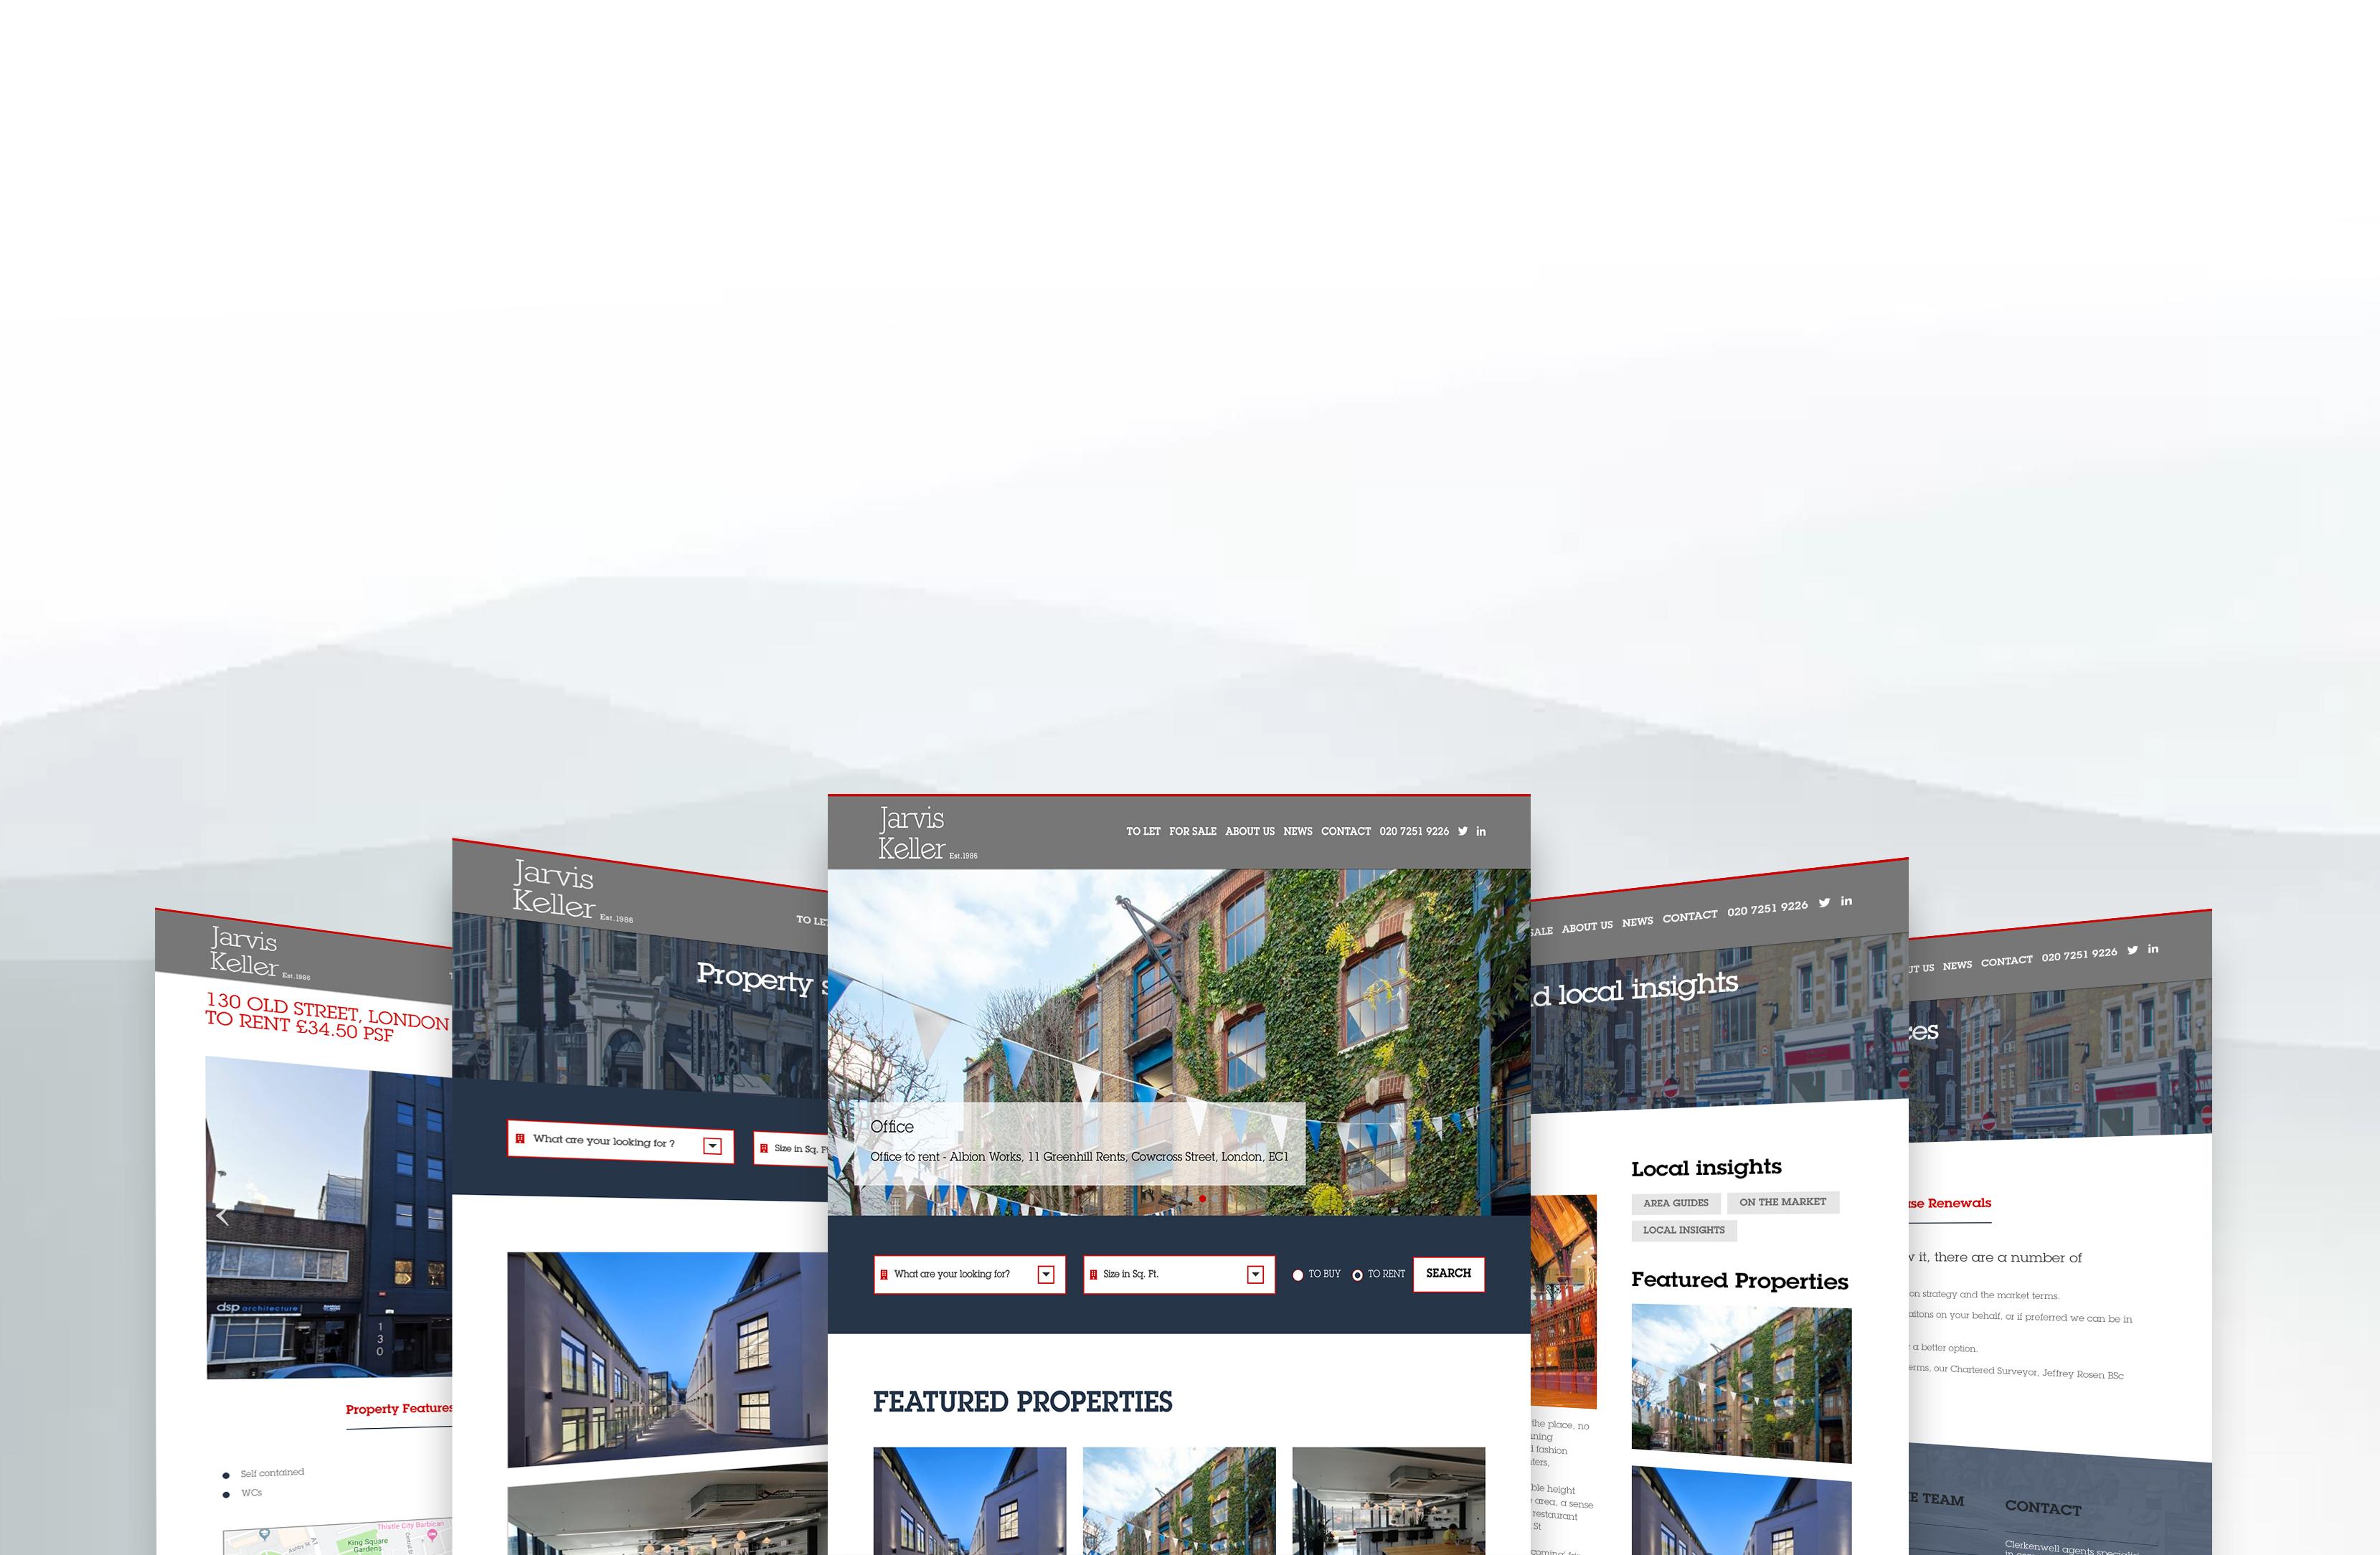 Every estate agent needs a solid well-designed website. We've put together a list of 10 steps to building good websites for estate agents